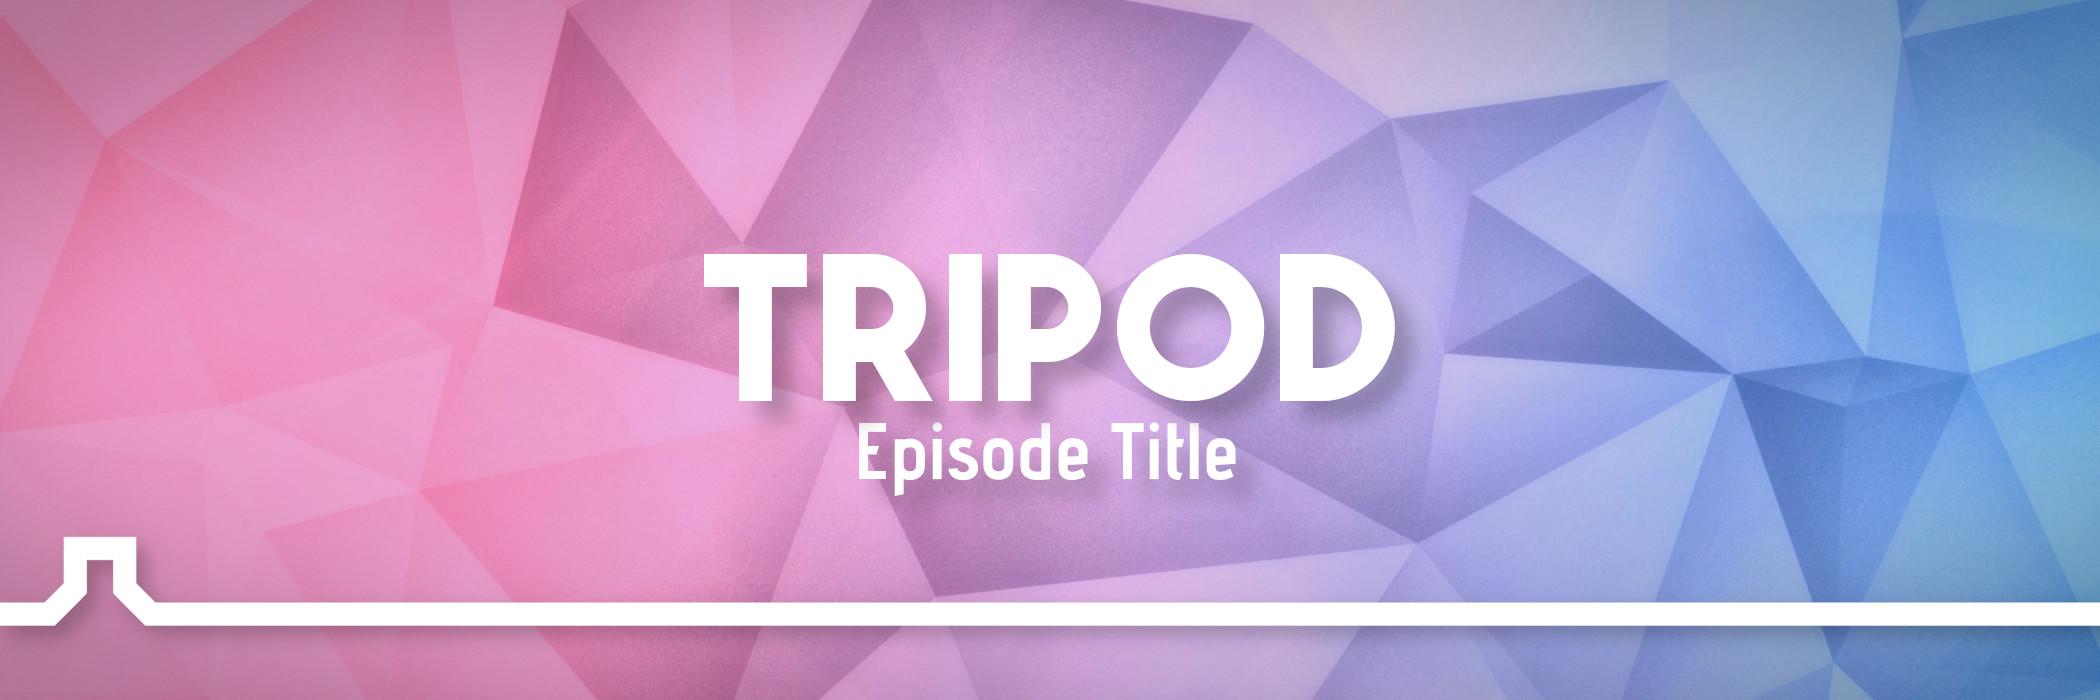 Episode Title – Tripod ep. 6